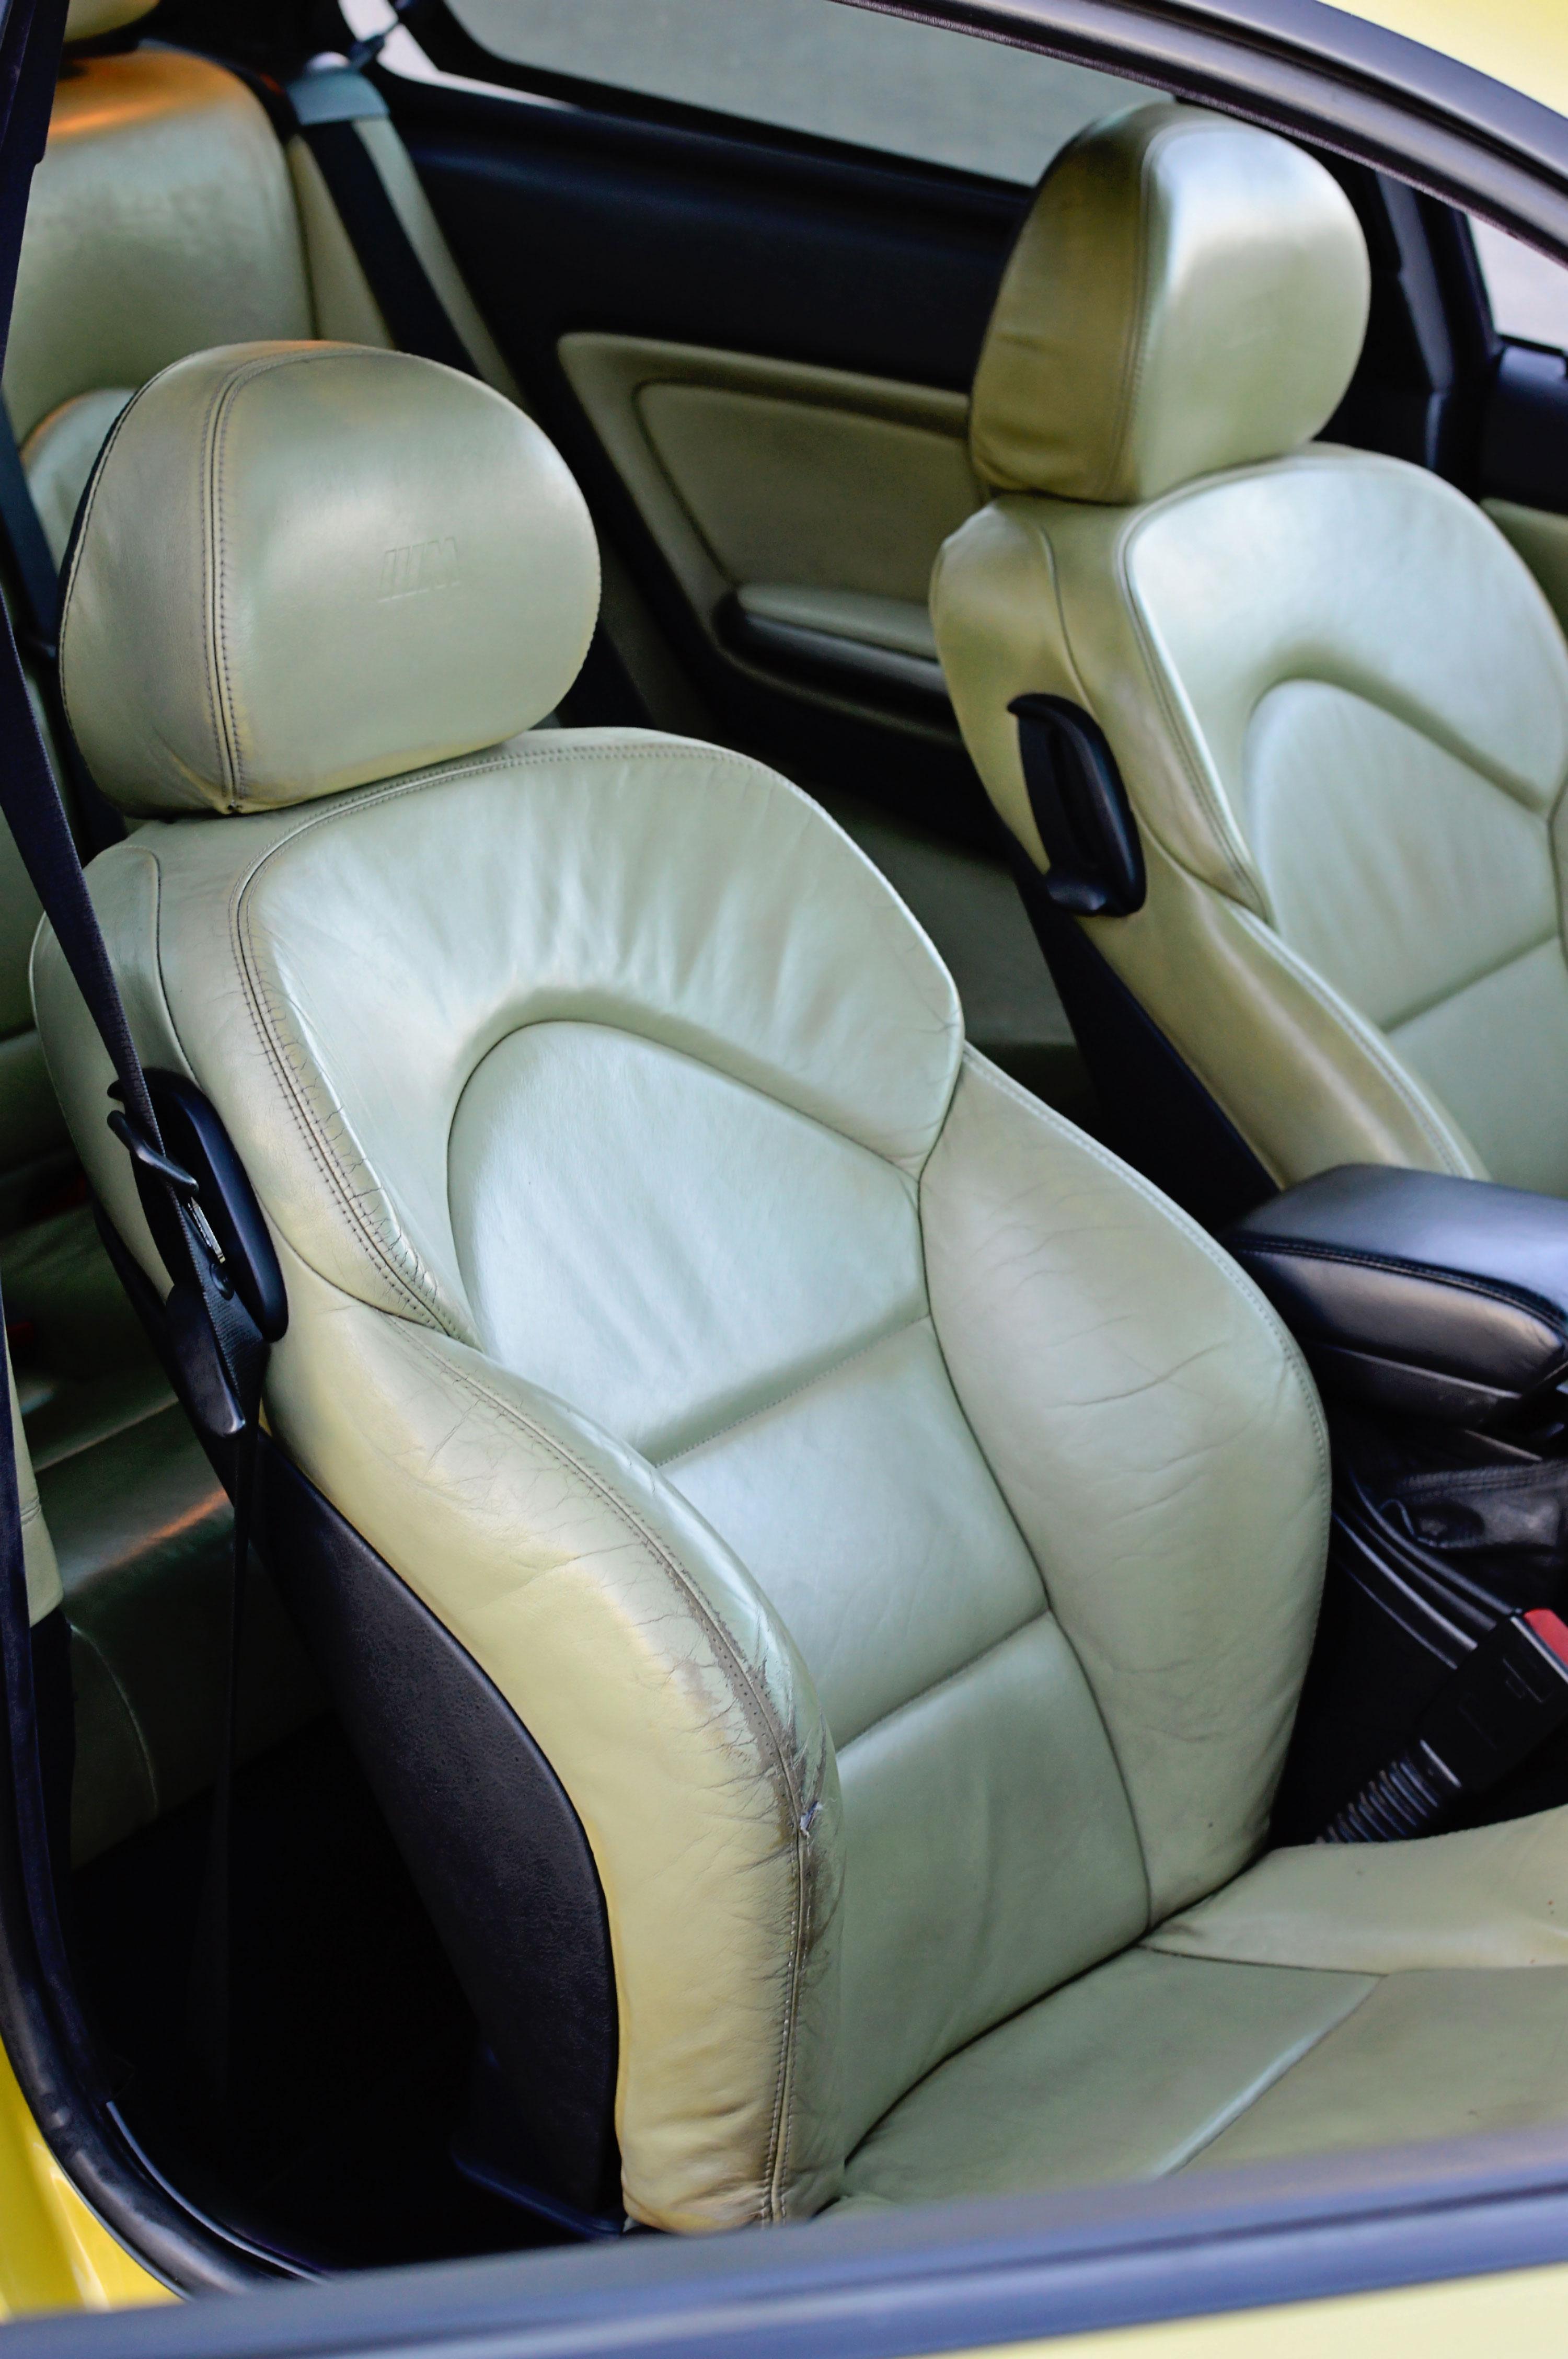 BMW E46 M3 (2000 - 2006) buying advice